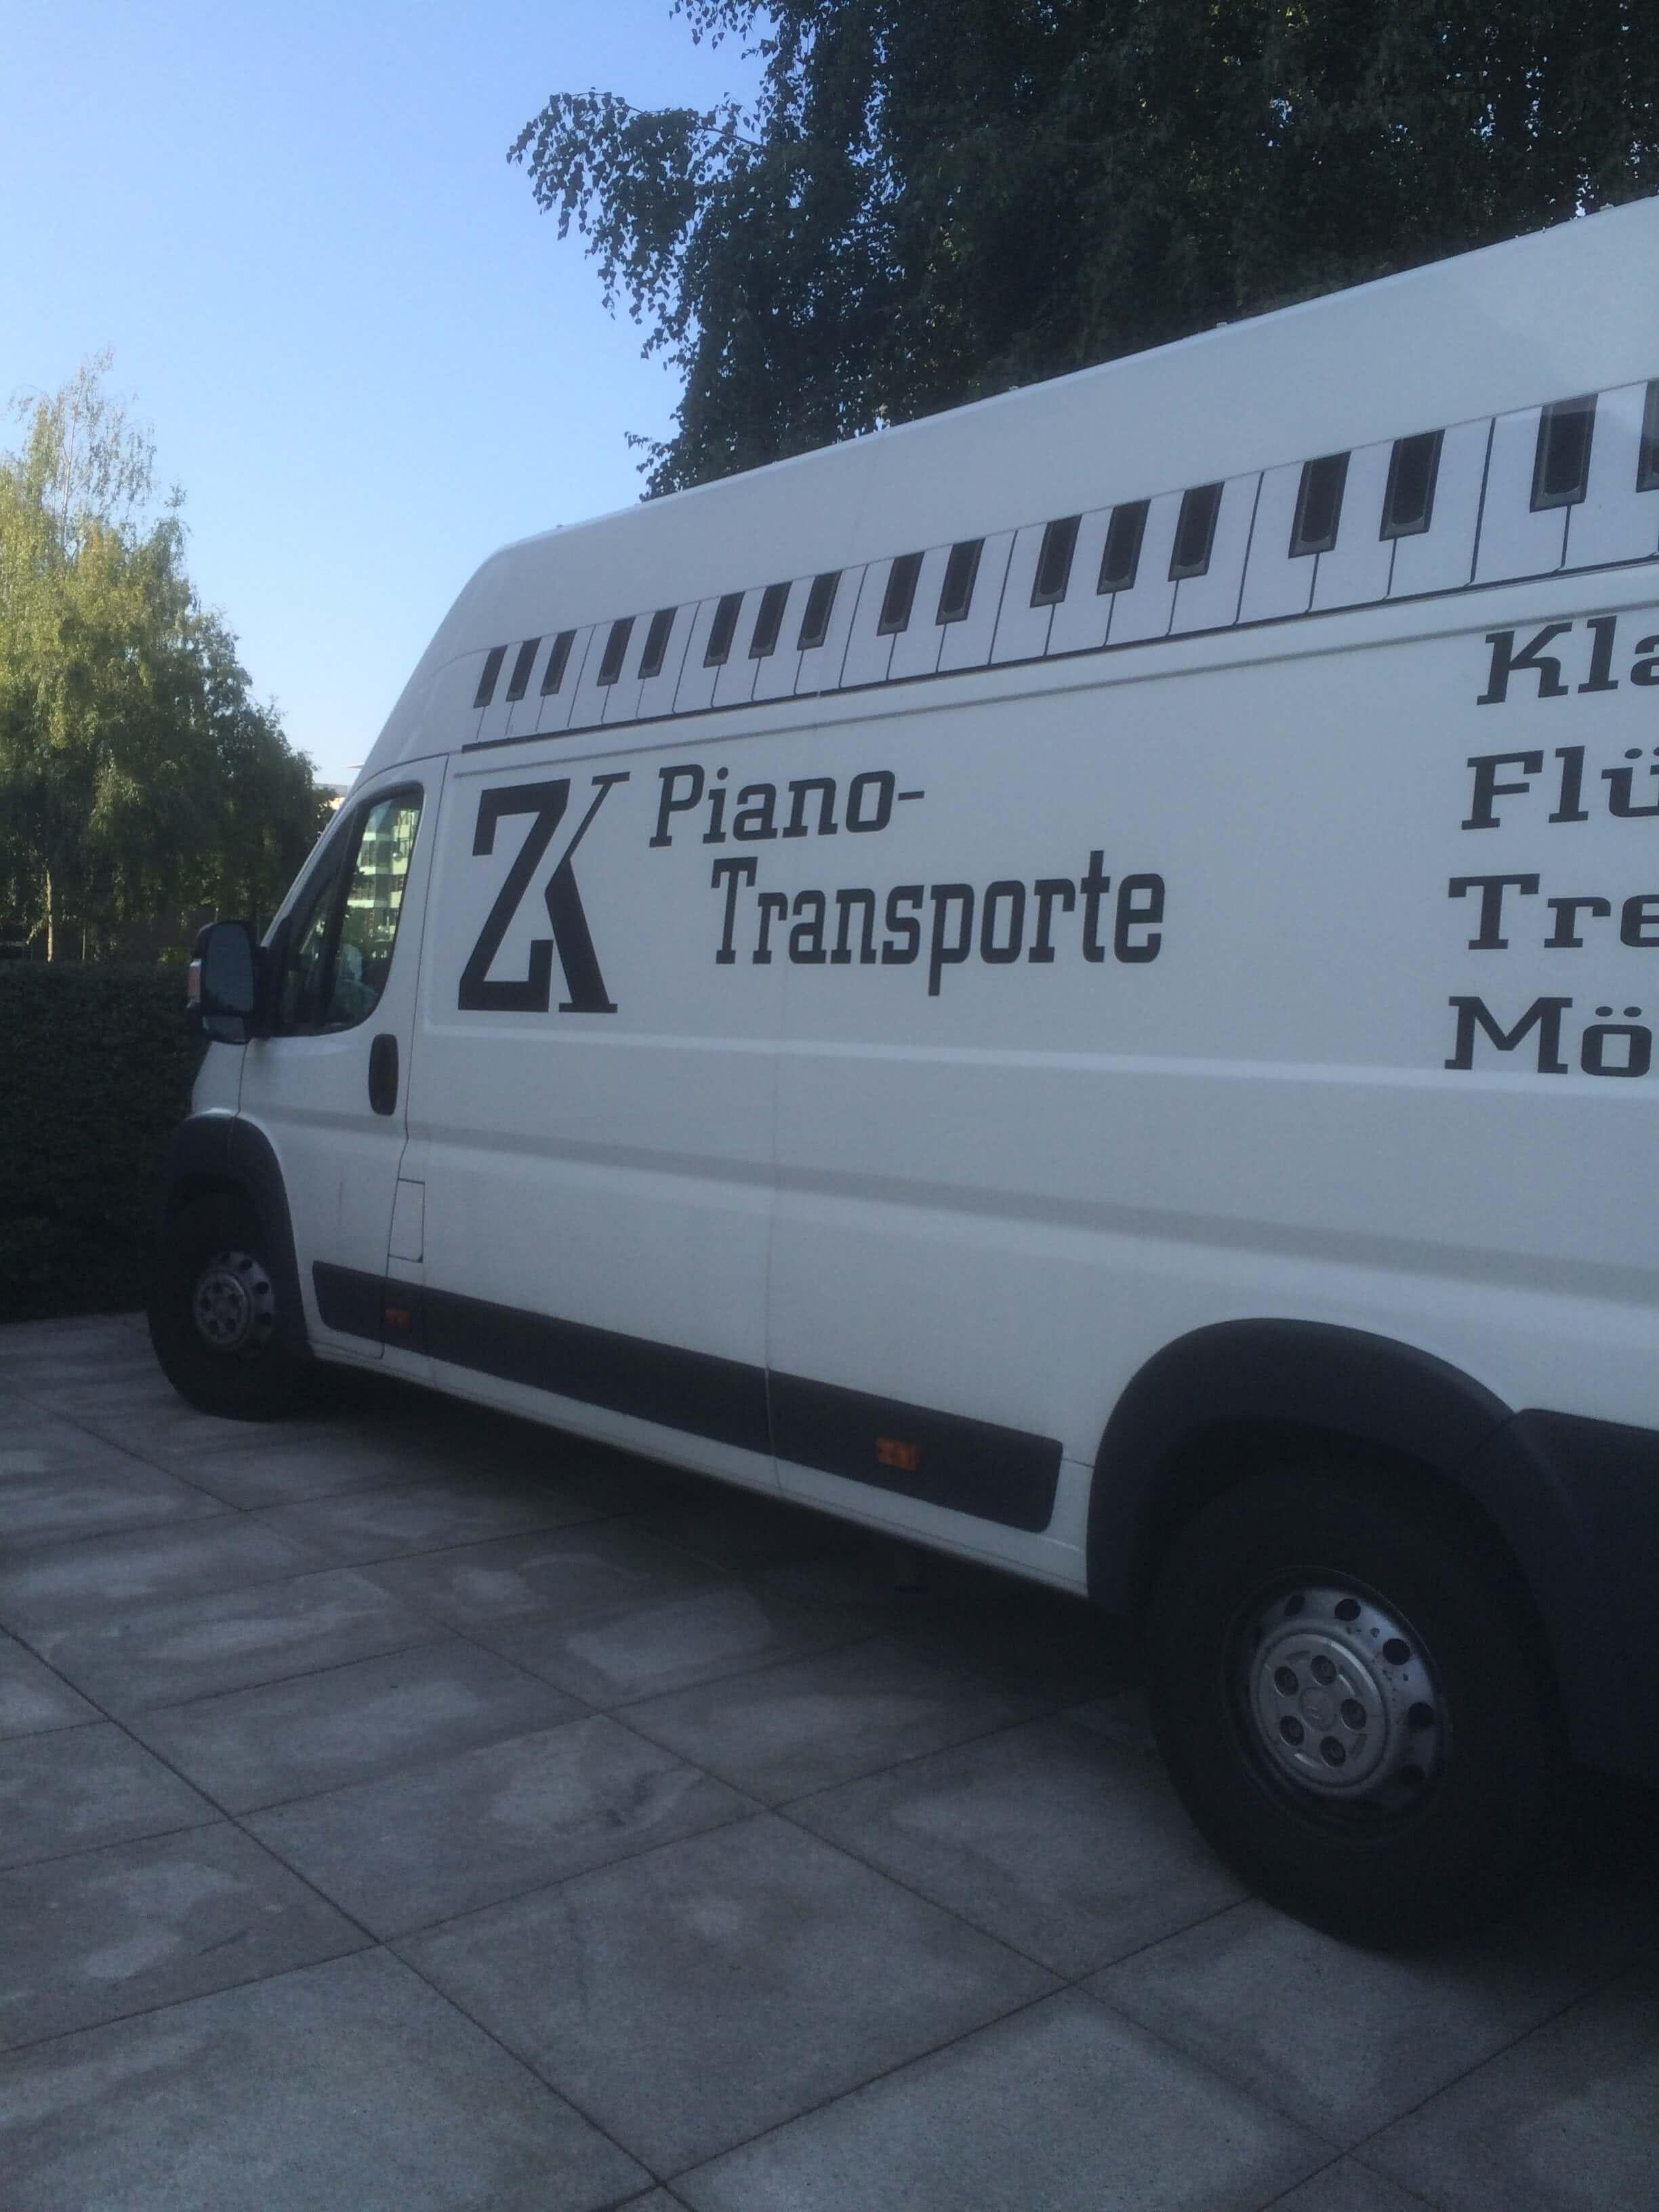 ZK Piano Transporter bei der Konrad Adenauer Stiftung